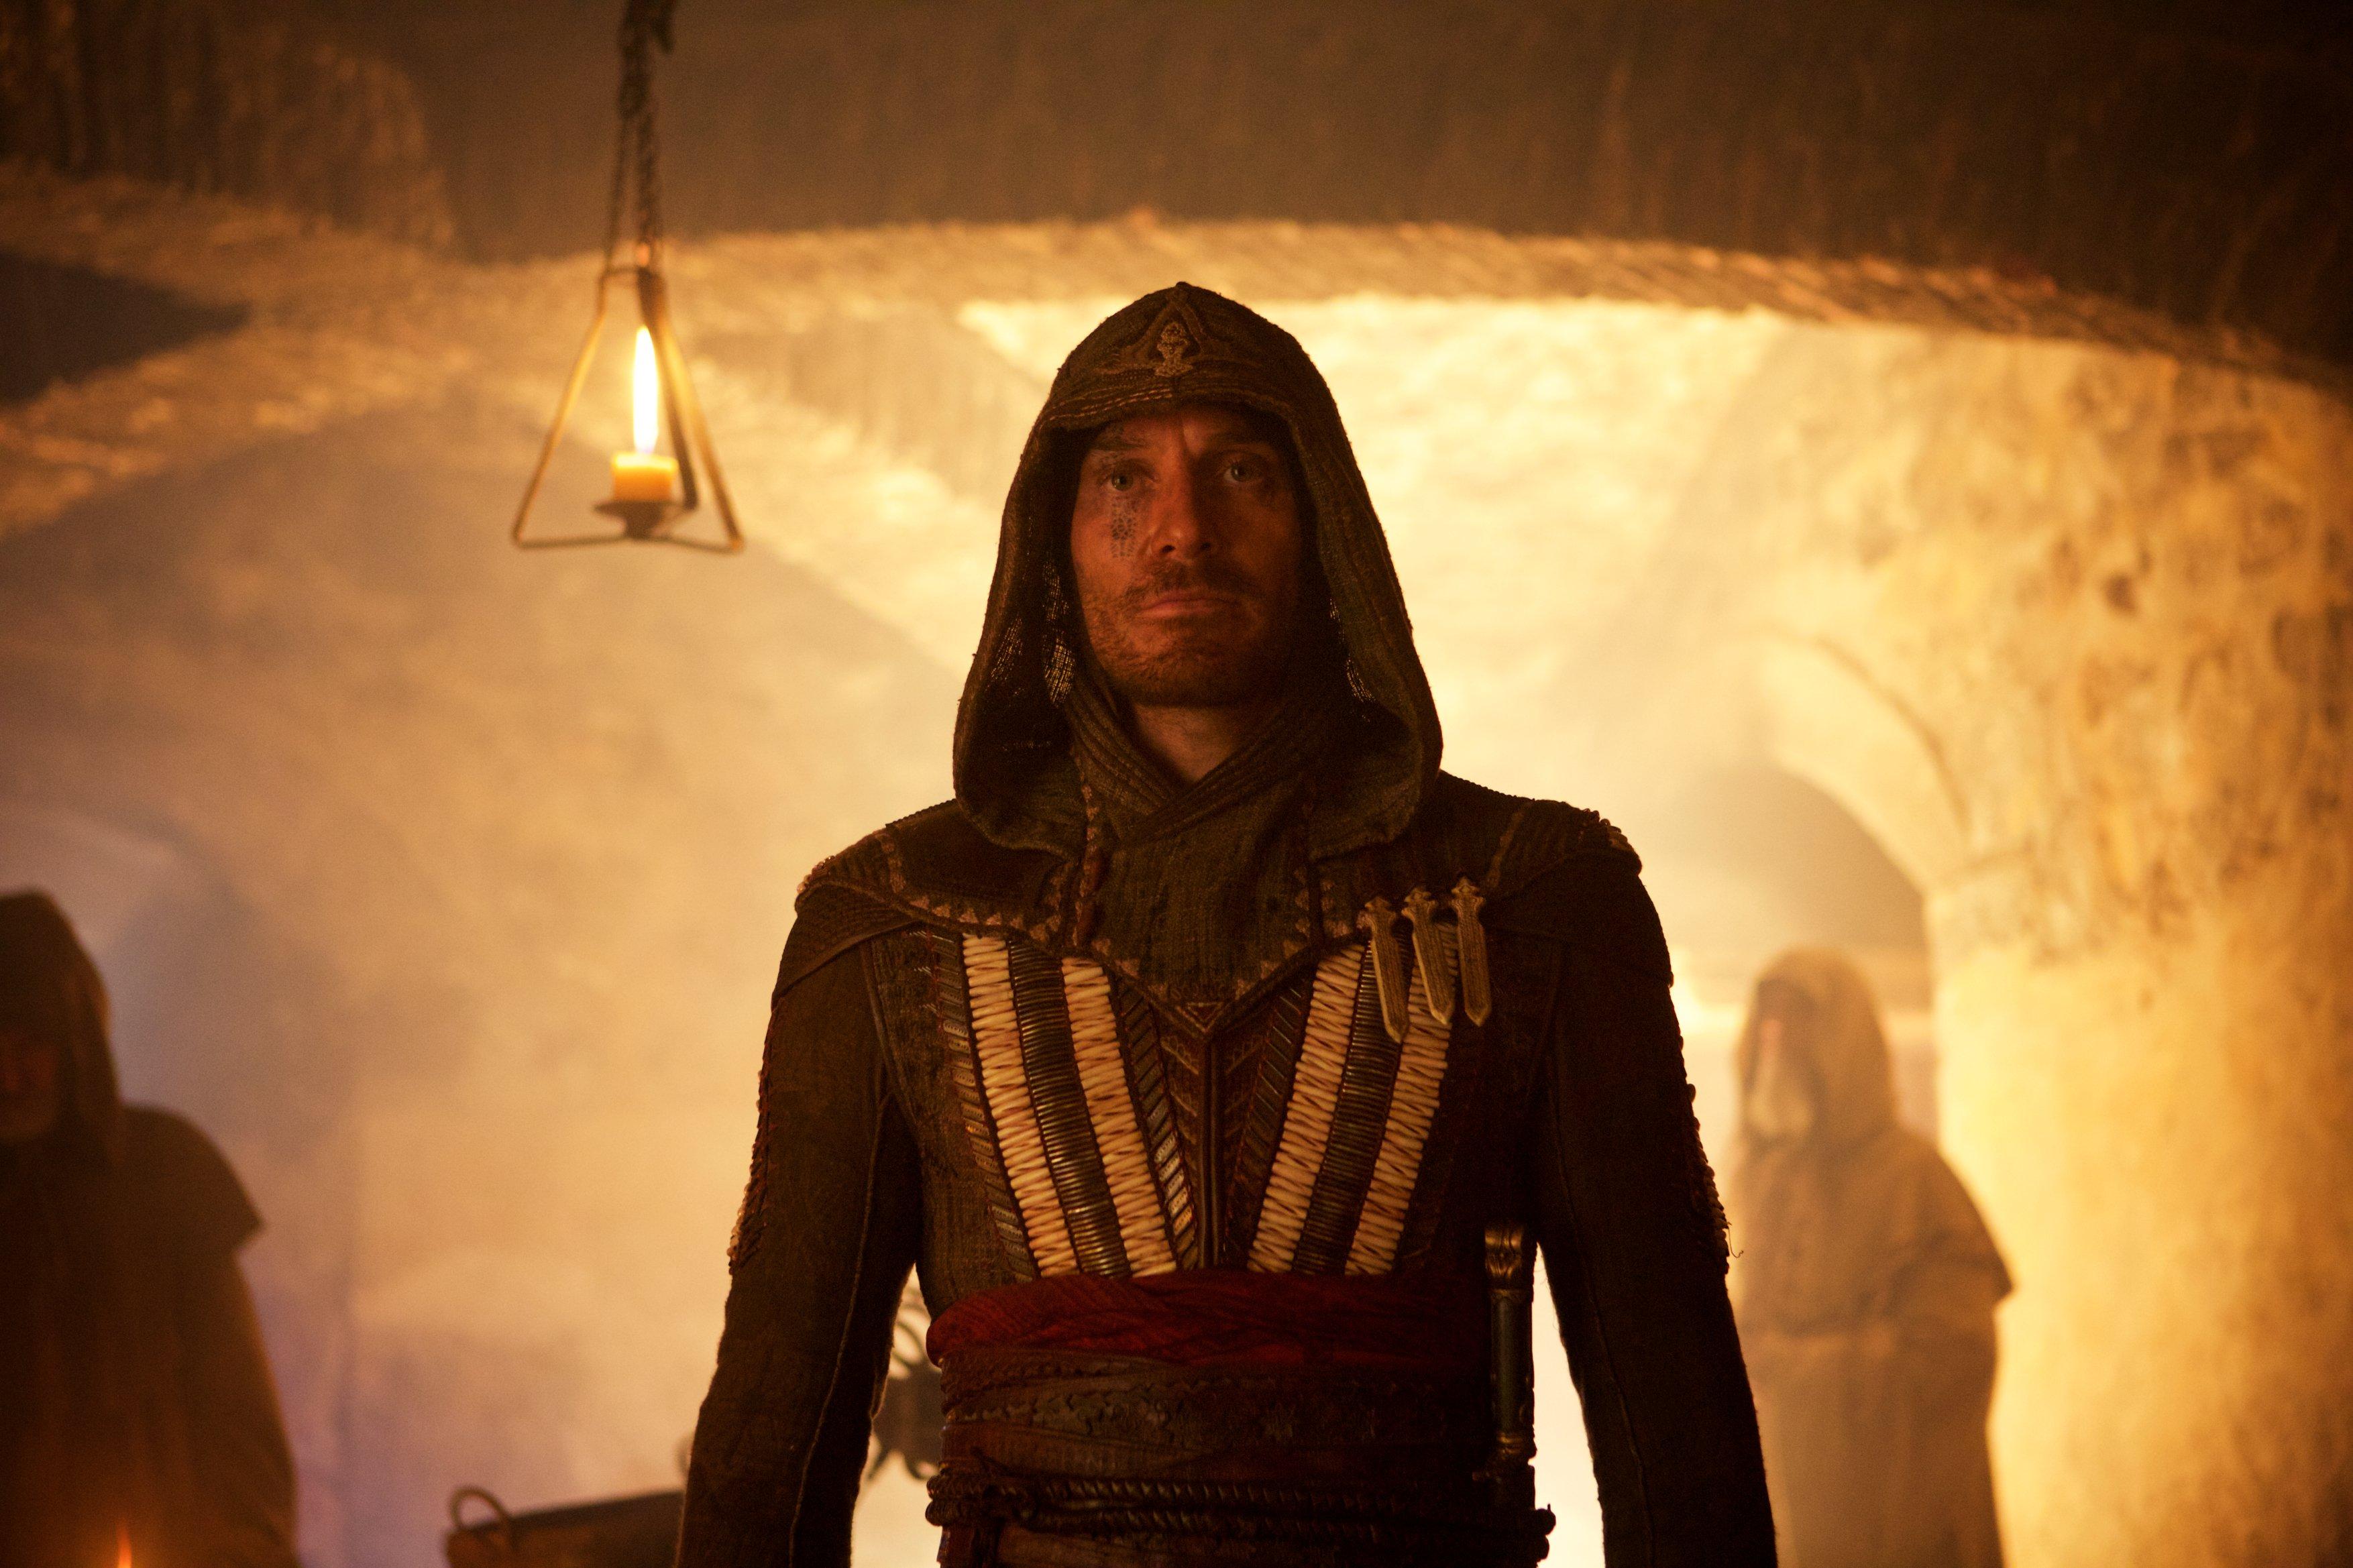 Review - Assassin's Creed - Still 4